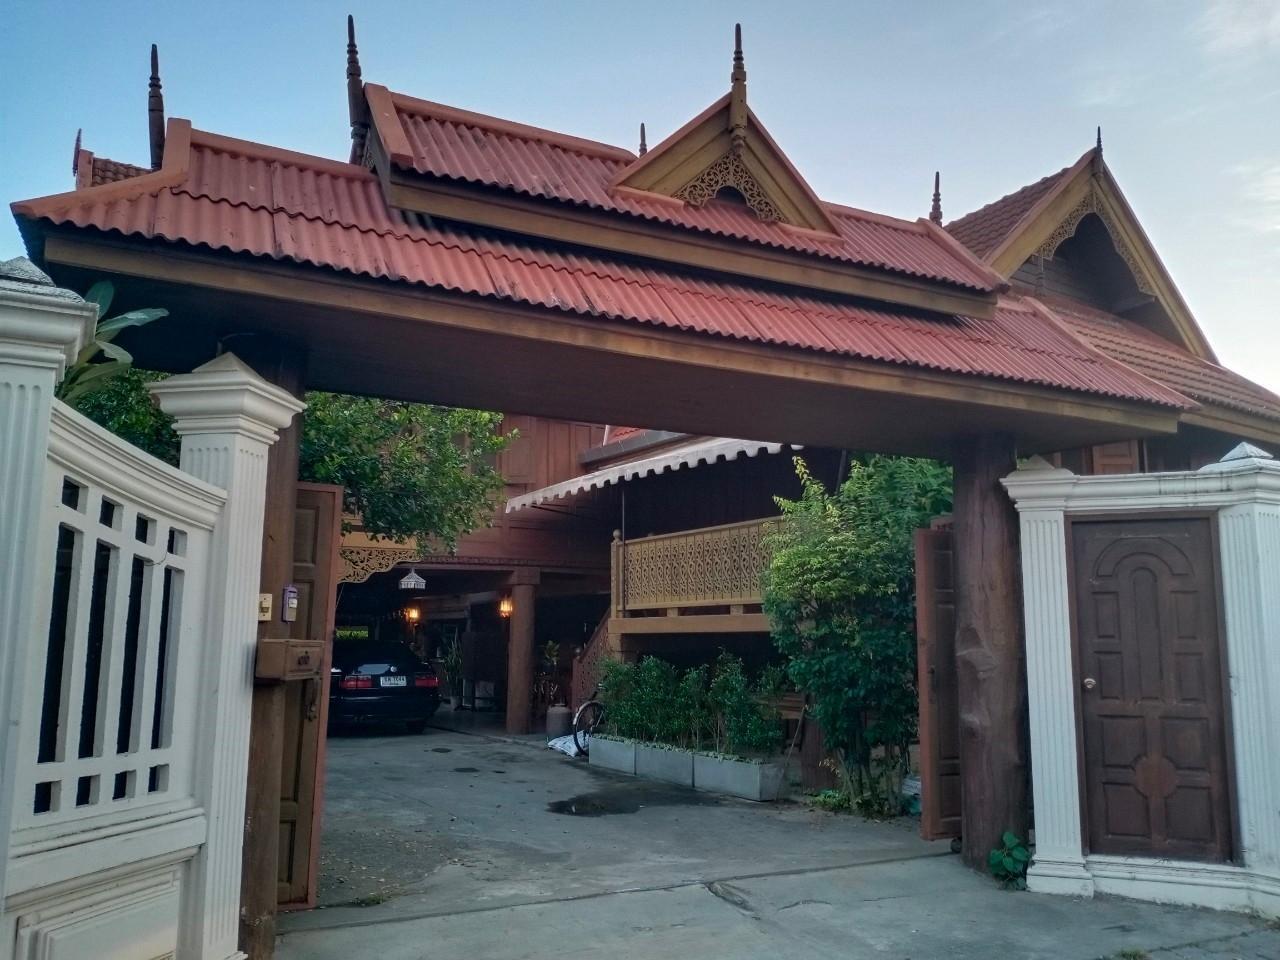 Chiangmai vintage home บ้านเดี่ยว 4 ห้องนอน 6 ห้องน้ำส่วนตัว ขนาด 250 ตร.ม. – ข้าวสาร